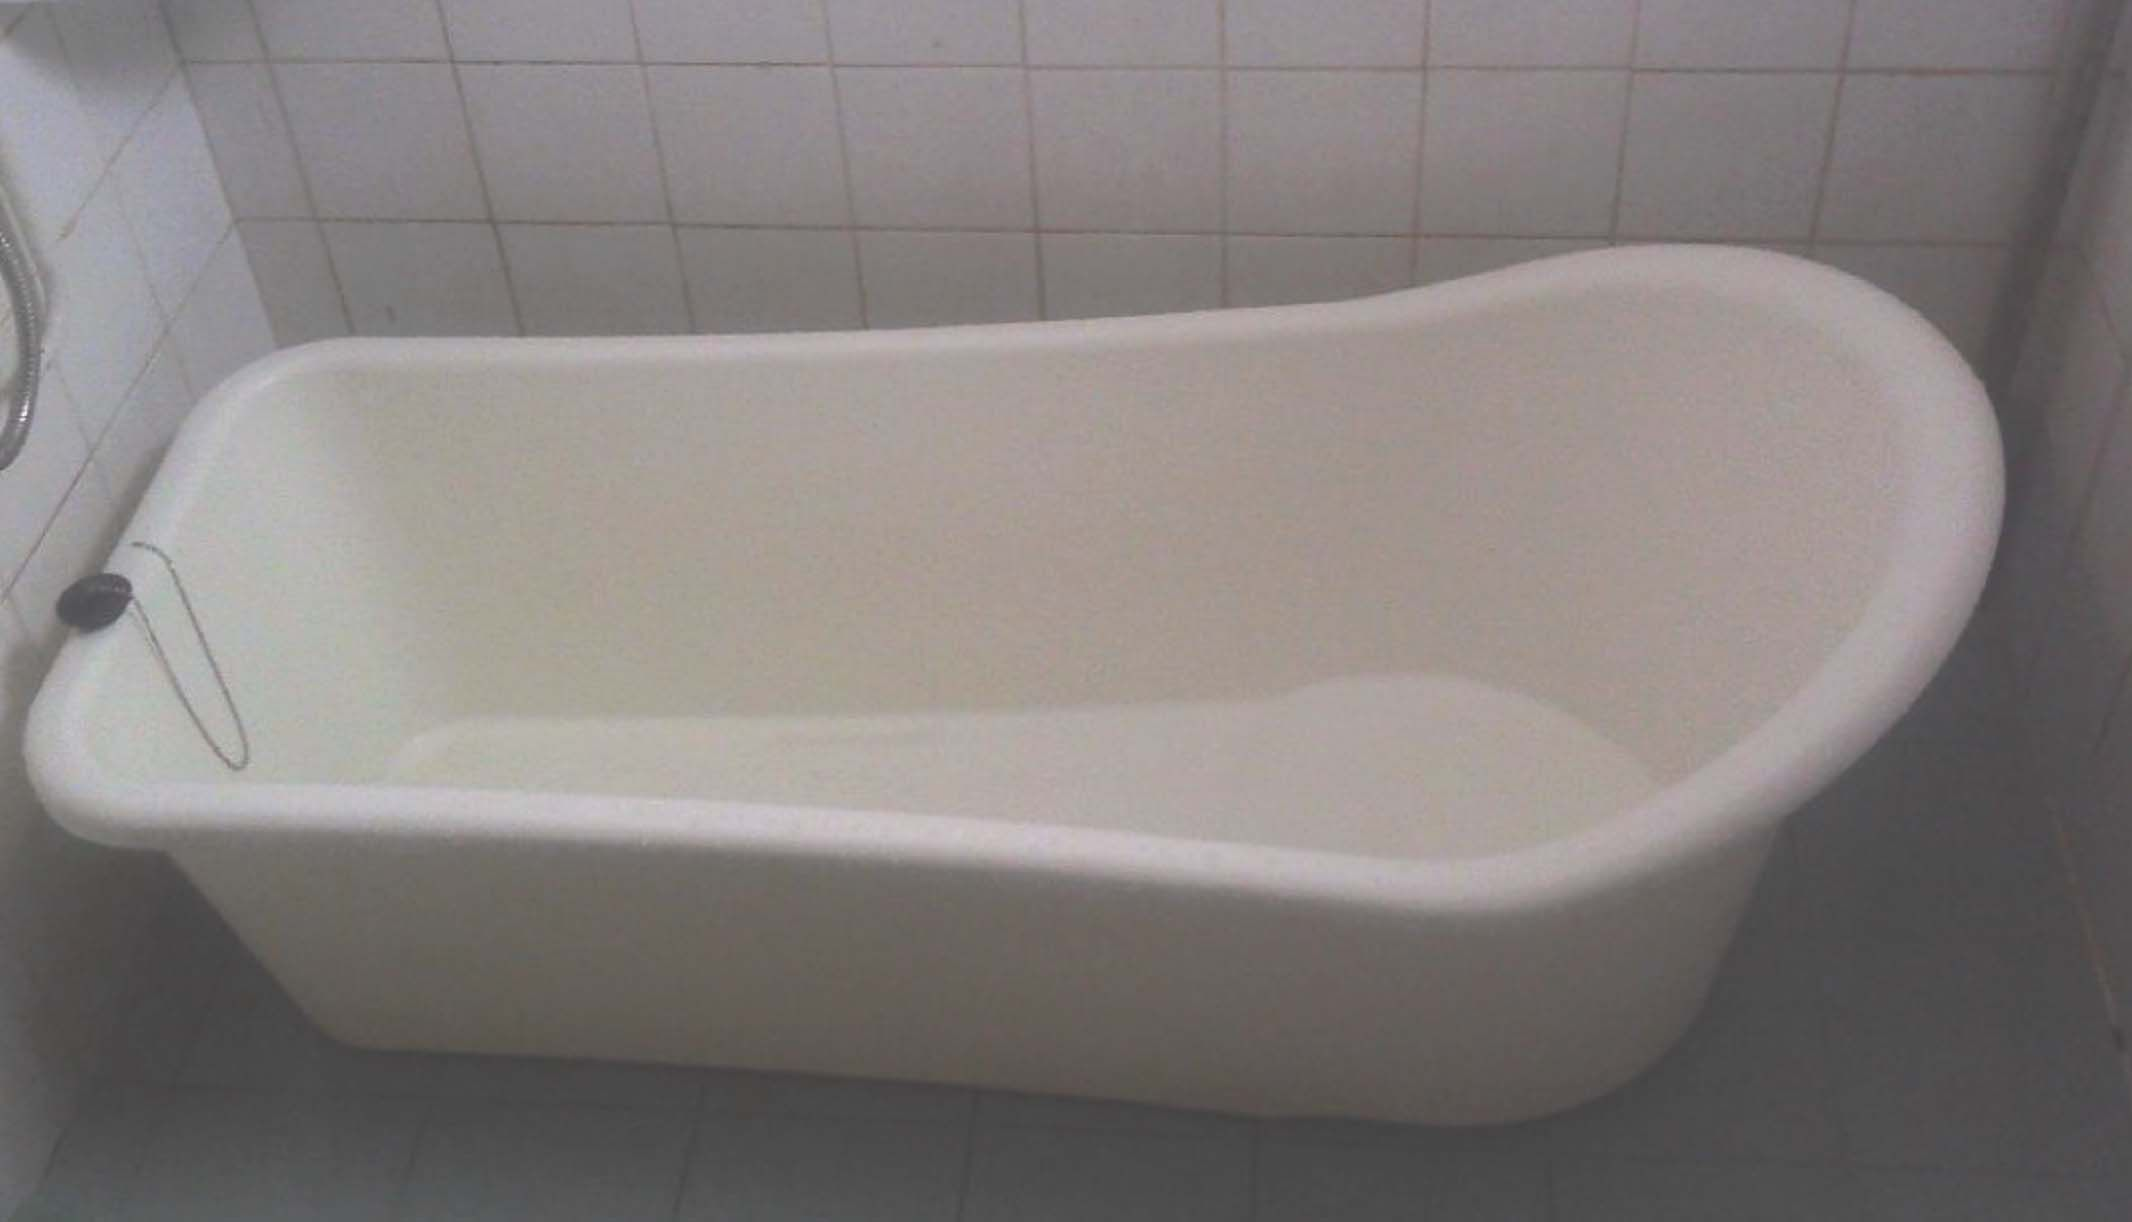 Toddler Bath Tubs For Showers Wtf I Ve Got One For The Shed Diyer S Portable Bathtub